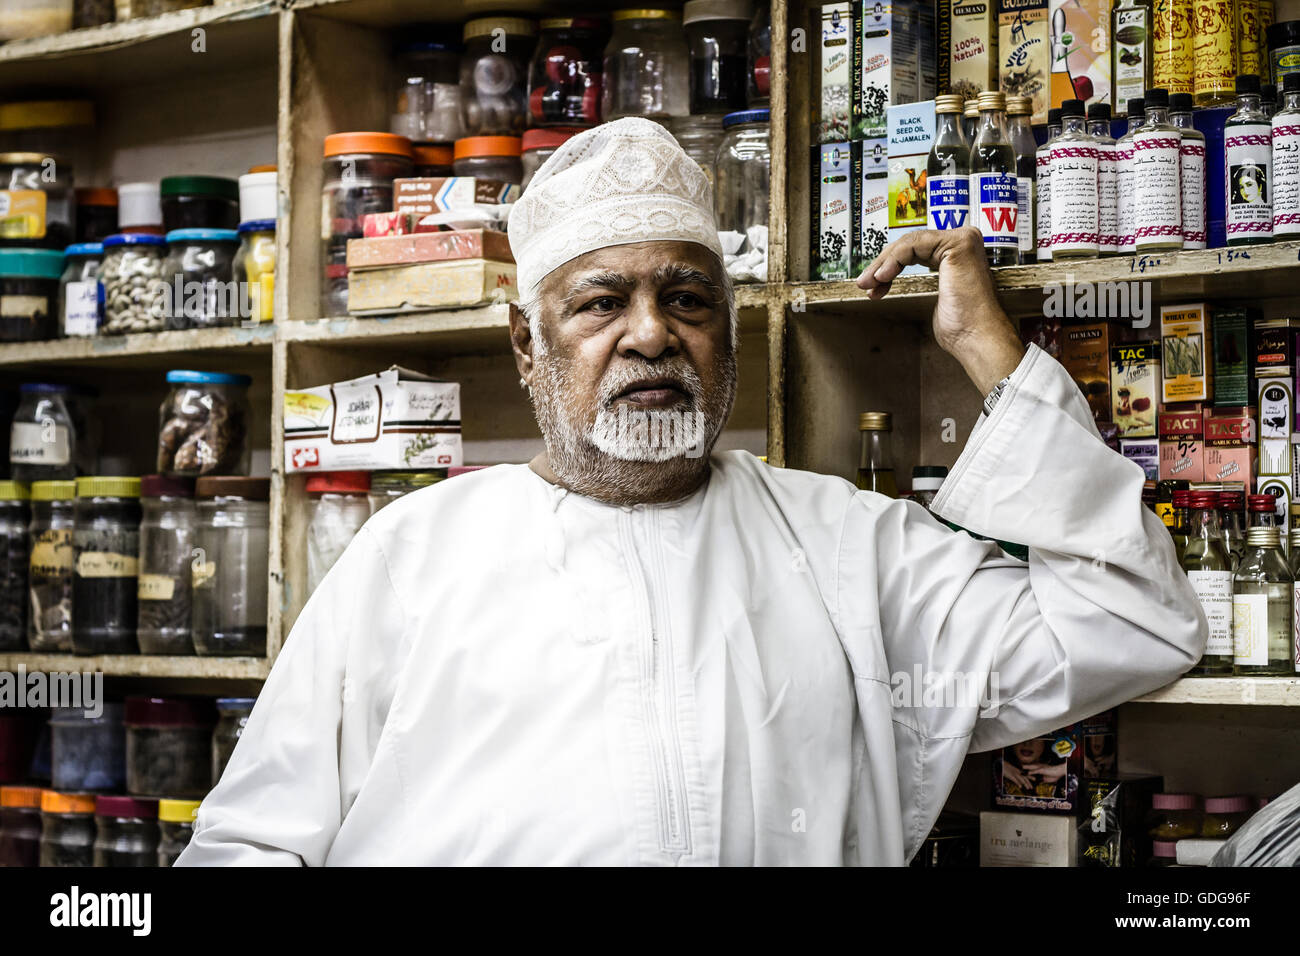 Spice Trader alten Muttrah Souk, Oman. Stockbild